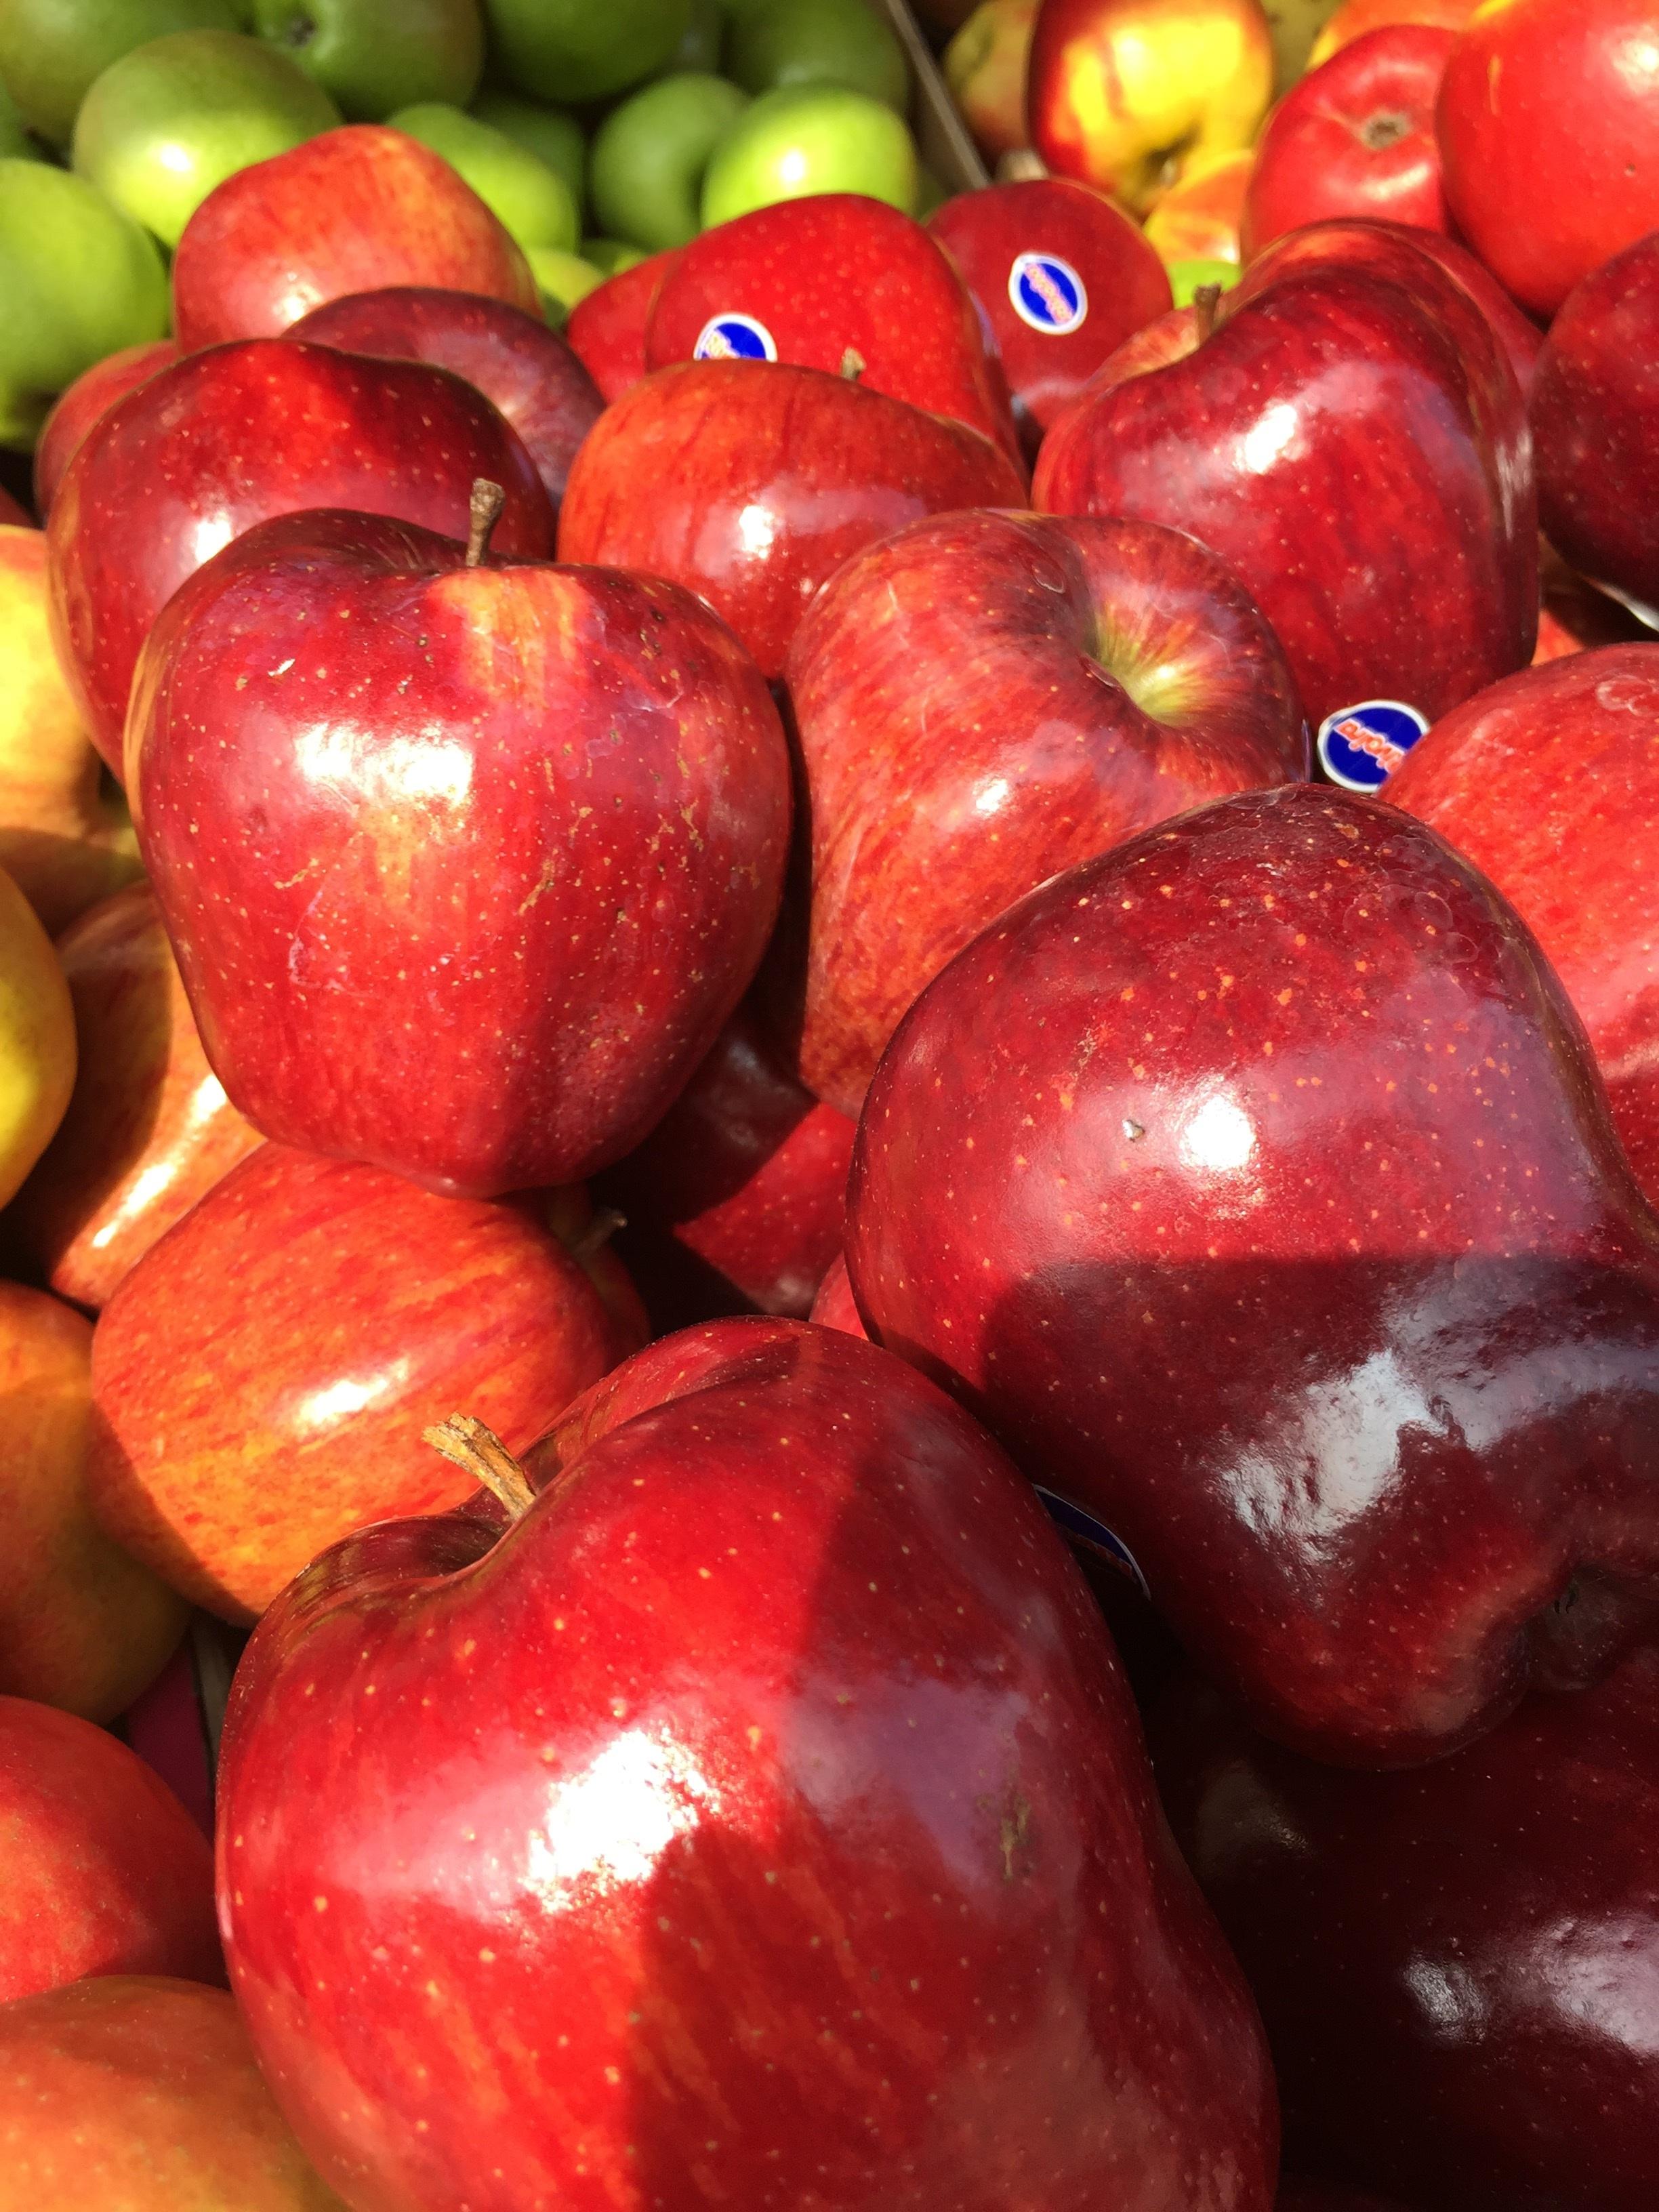 menggambar apel merah